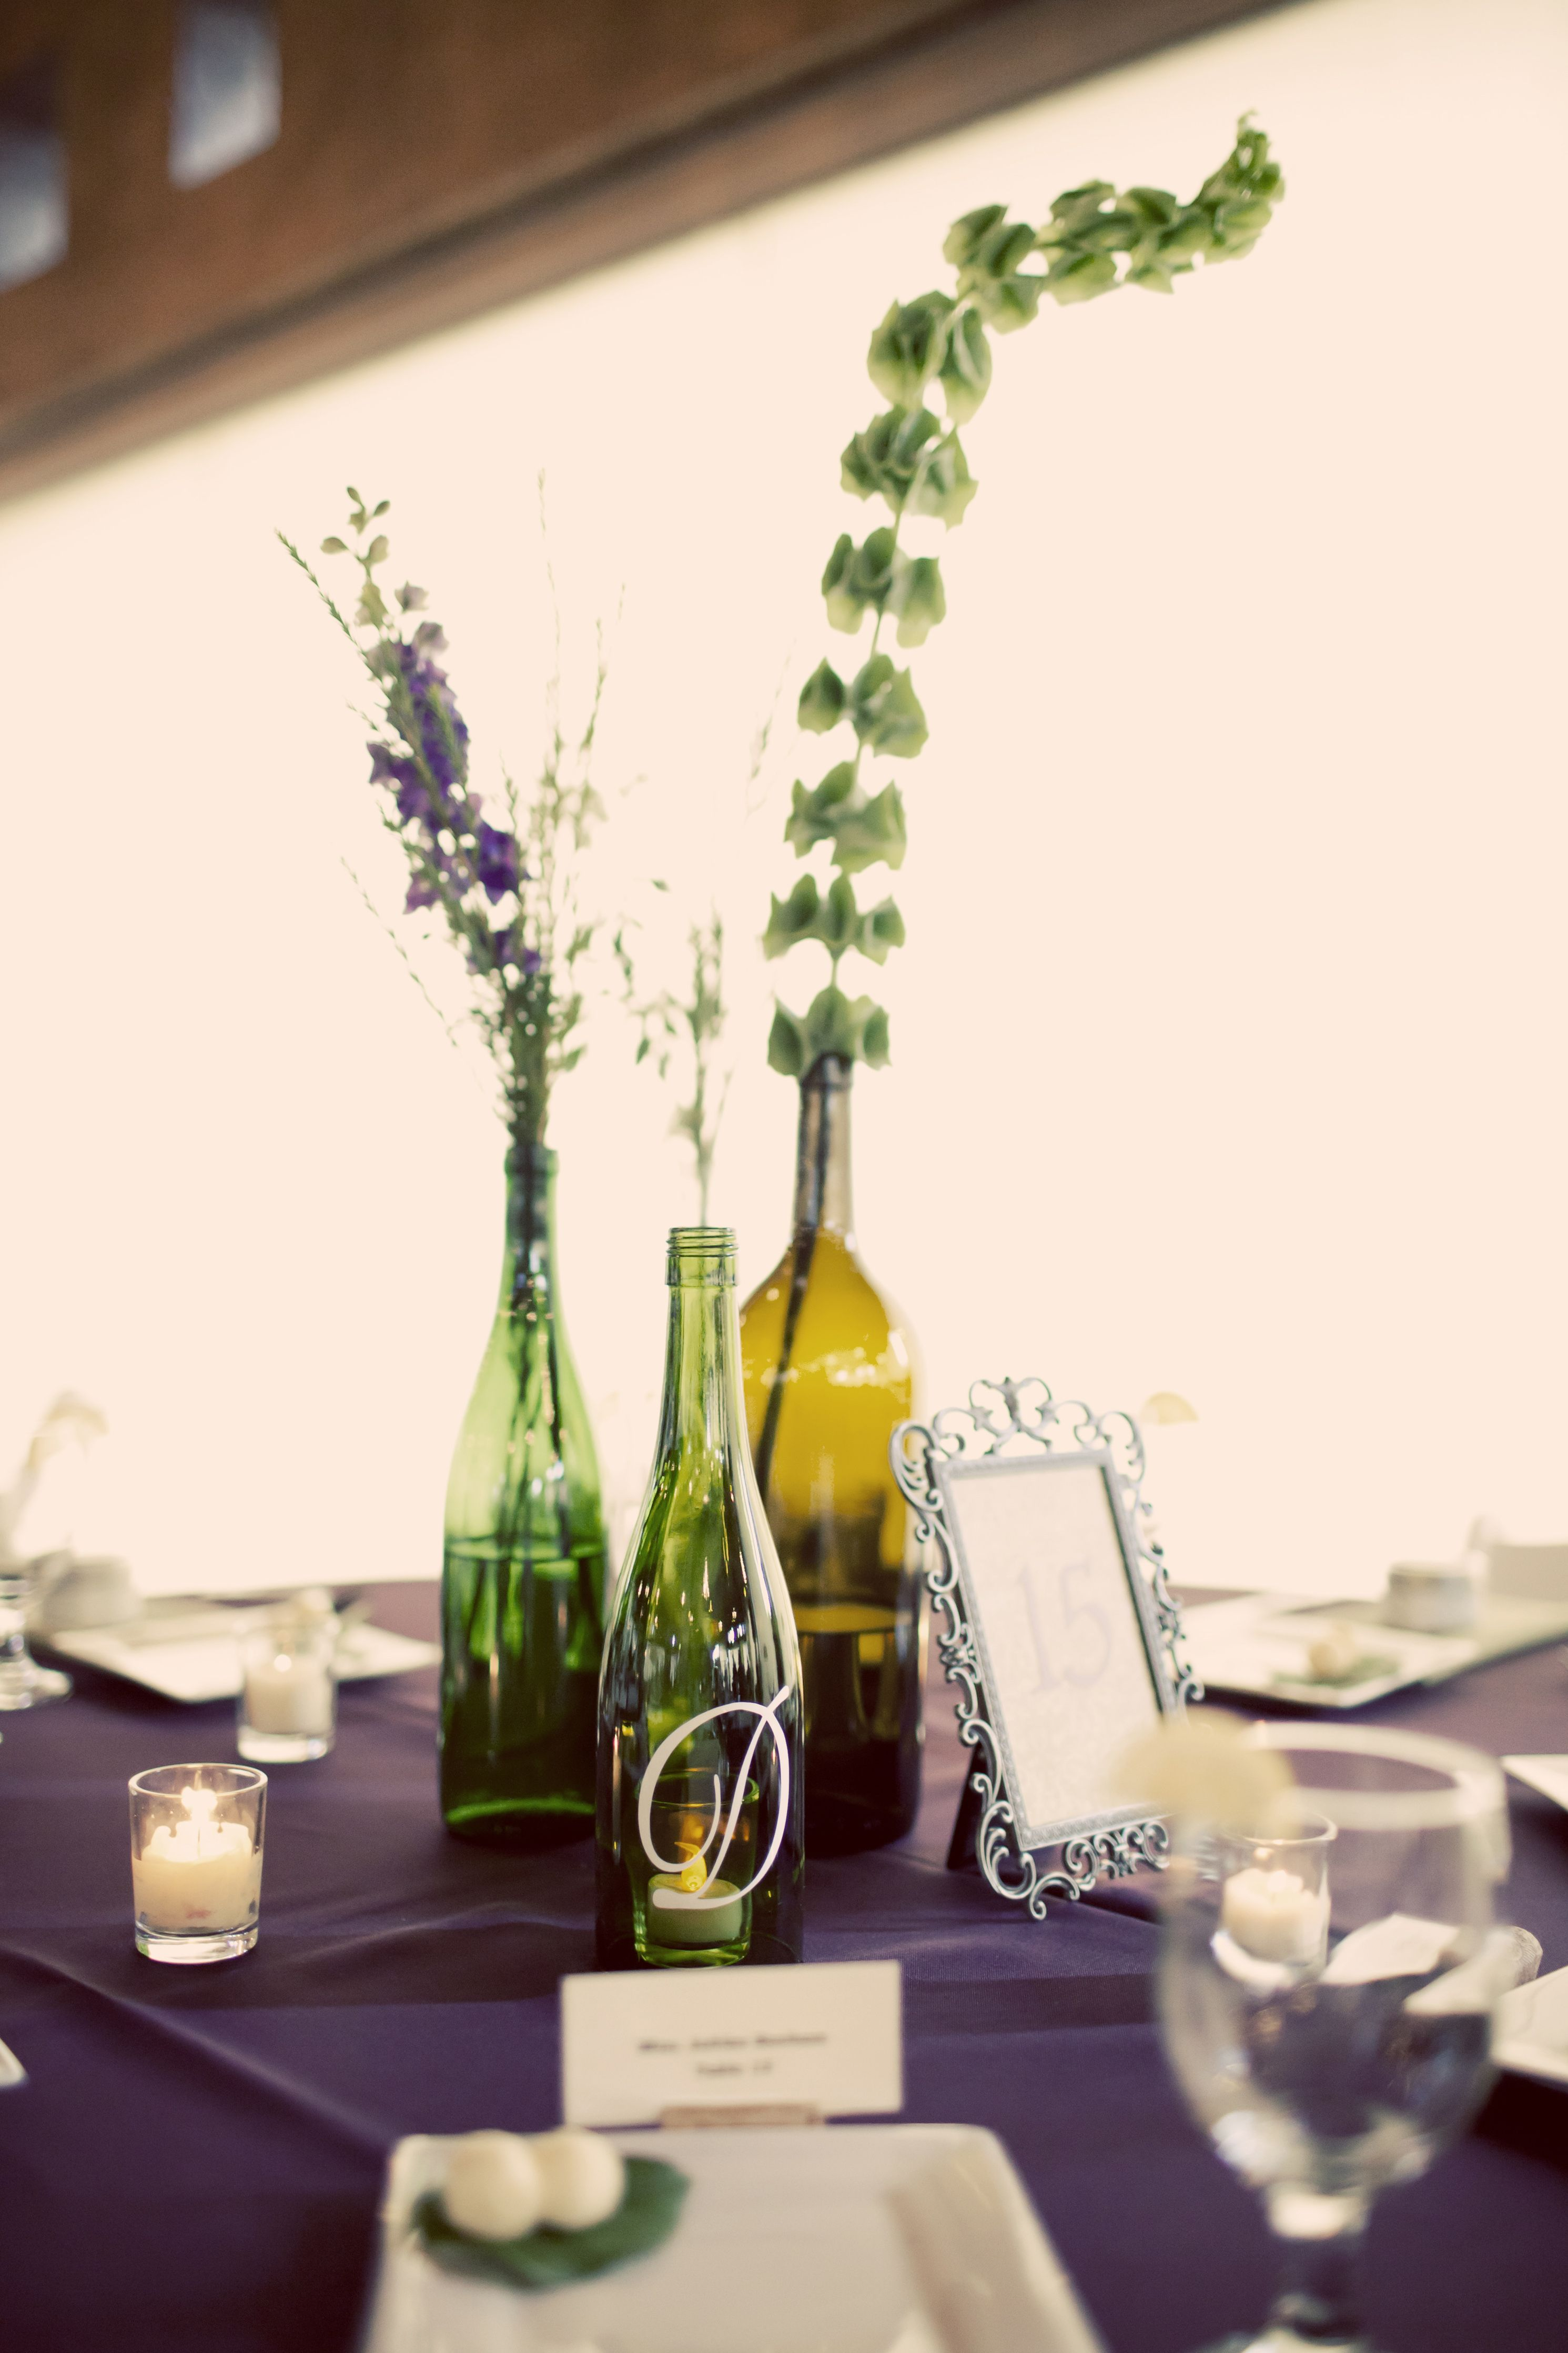 Contemporary Wedding Flowers In Wine Bottles Pattern - The Wedding ...